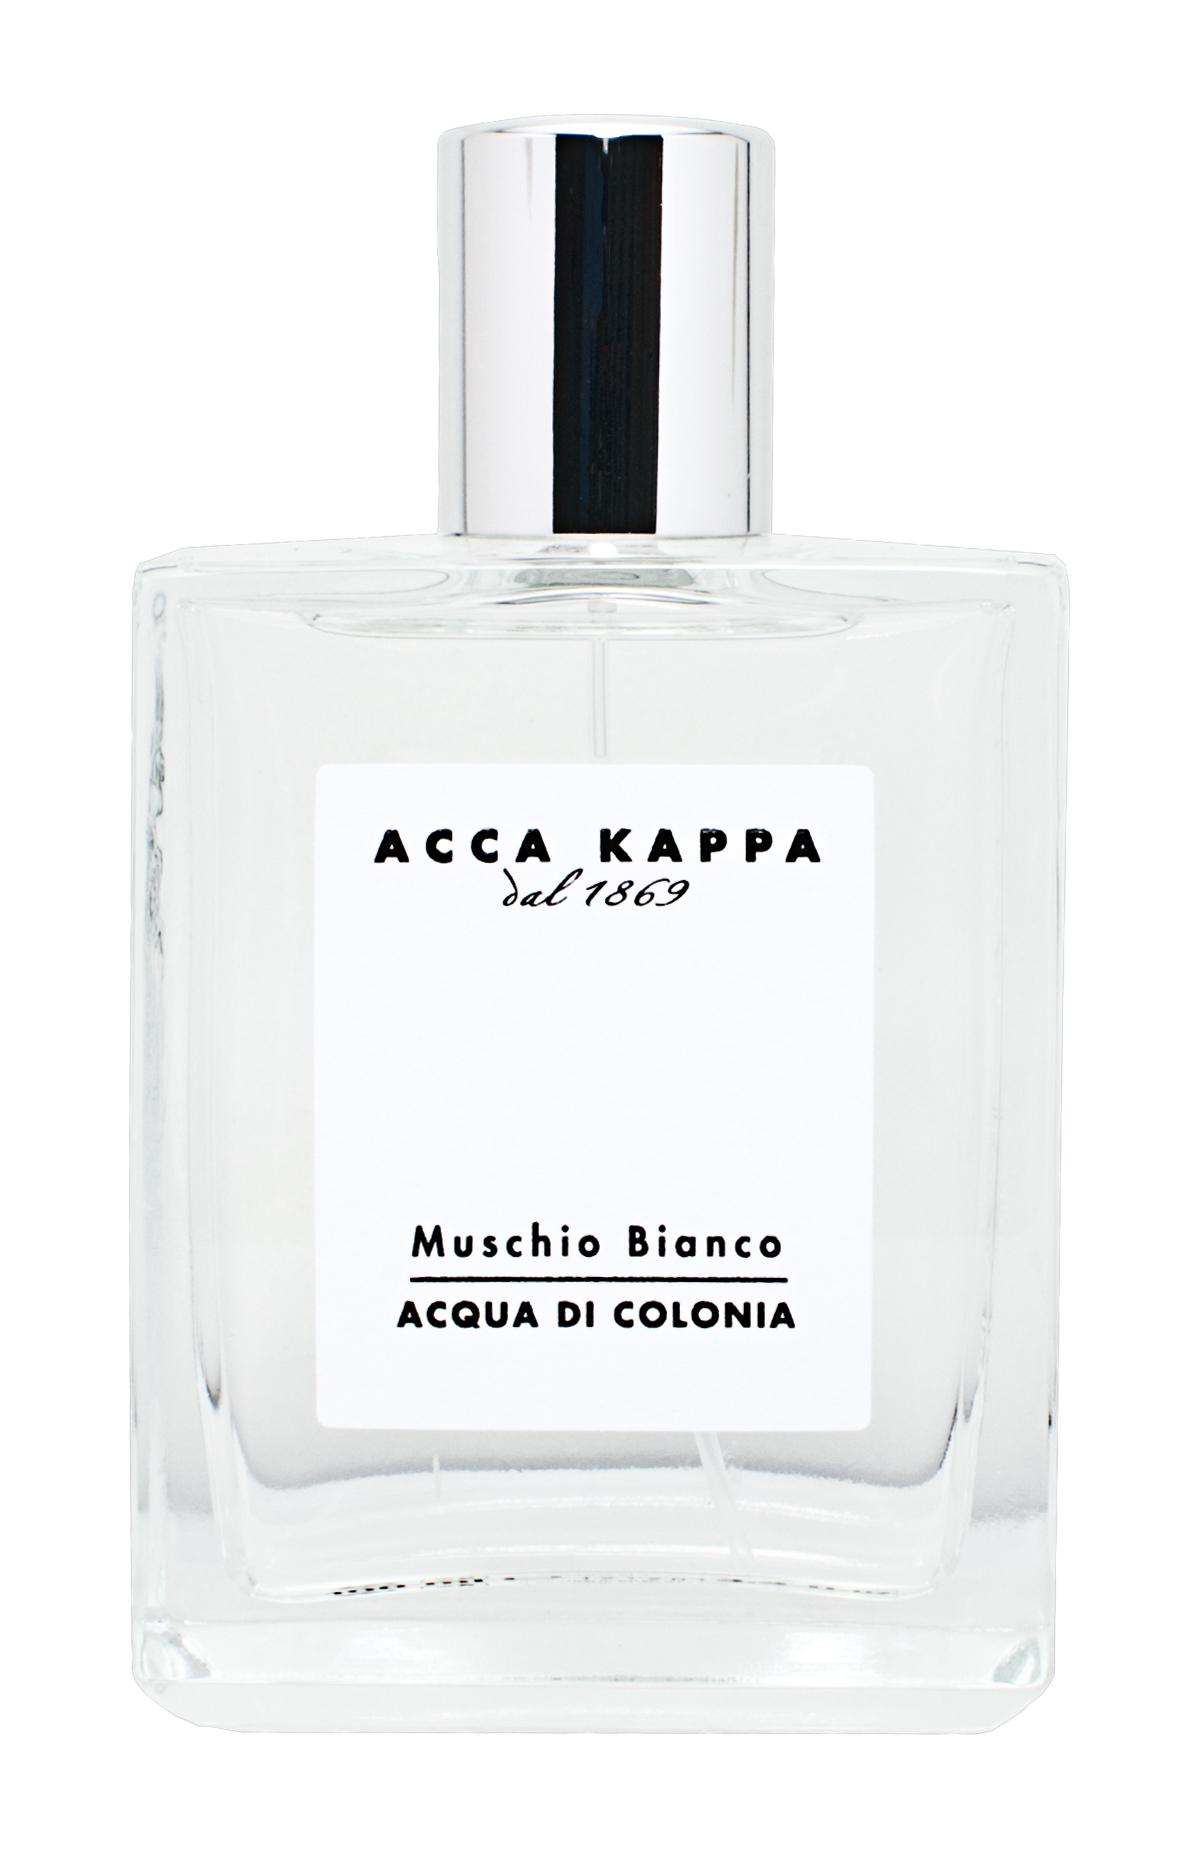 Acca Kappa Muschio Bianco